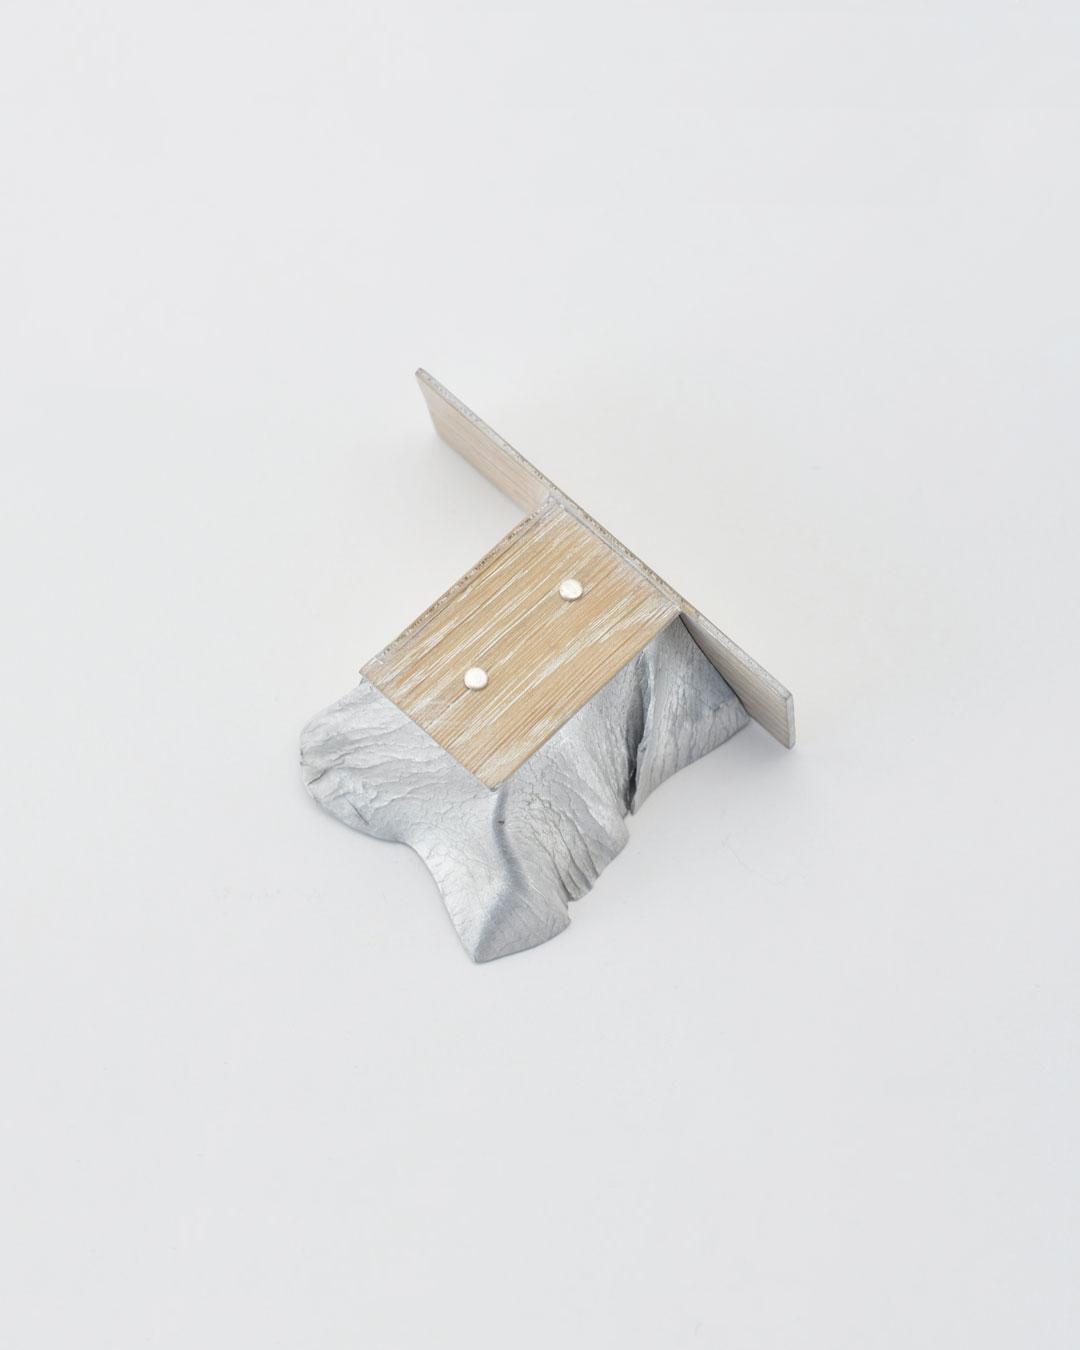 Anders Ljungberg, Declaration #4, 2019, brooch; aluminium, laminated oak, steel, 95 x 70 x 35 mm, €920